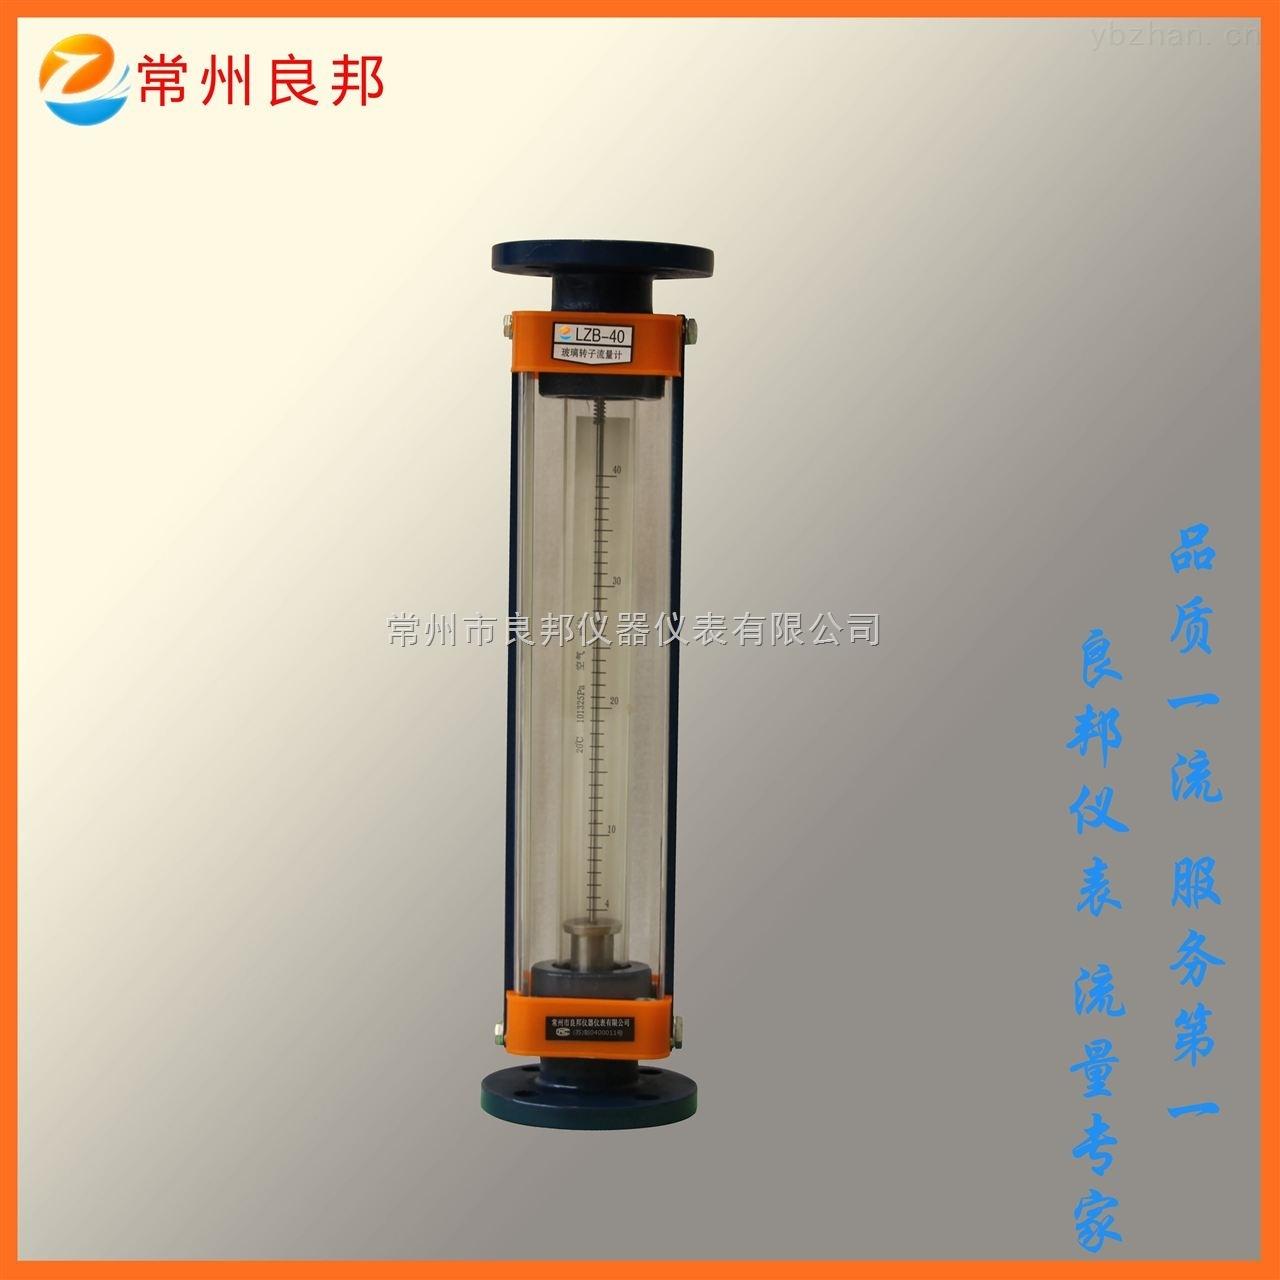 LZB-40F-LZB-40F气体玻璃转子流量计 CL2流量四氟防腐使用广泛 良邦仪表非标能力强